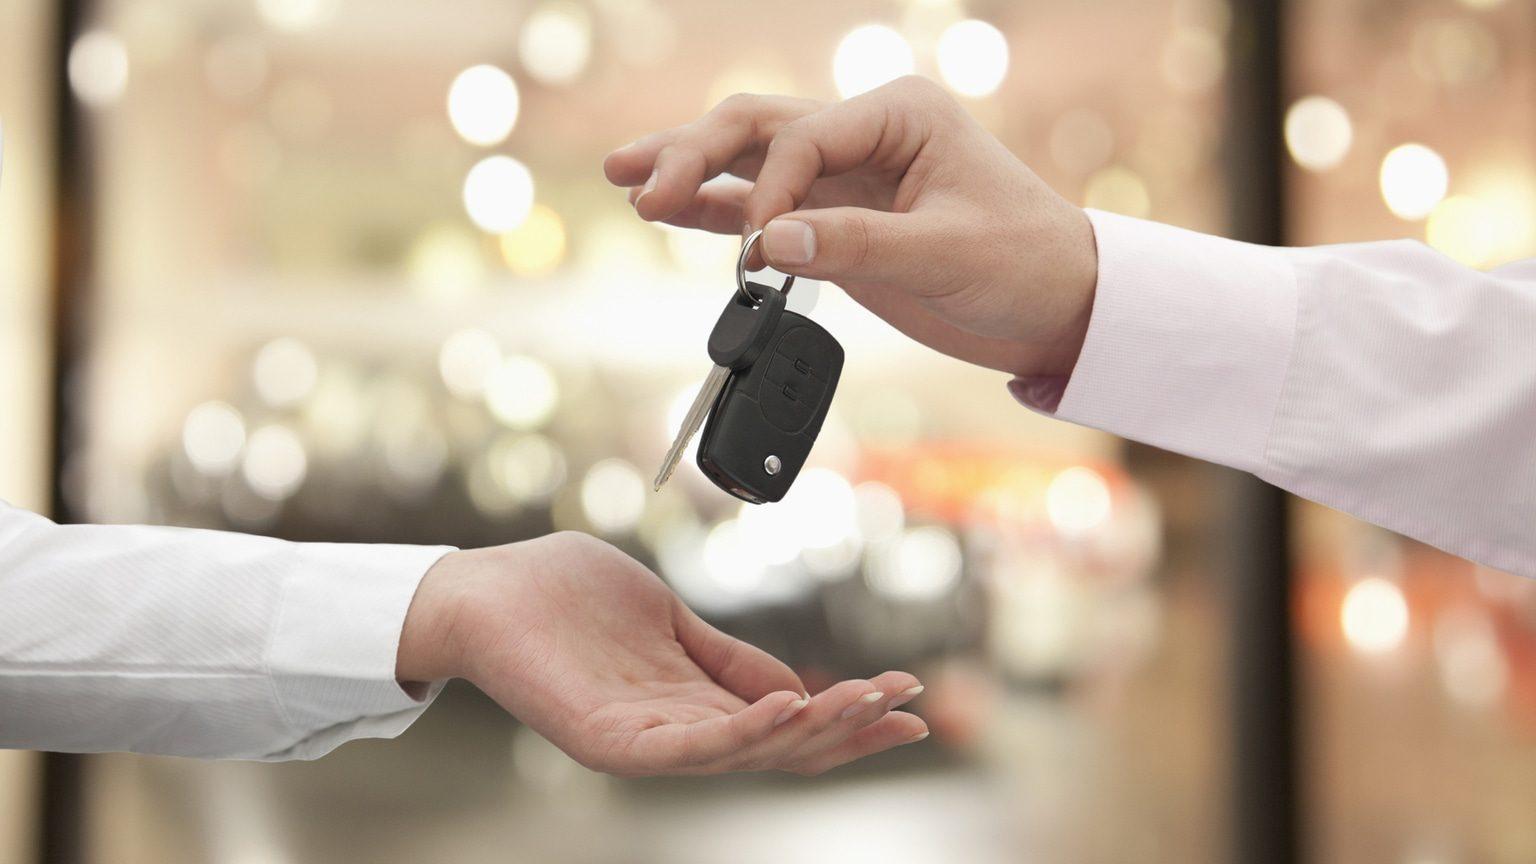 Car keys passing between two hands